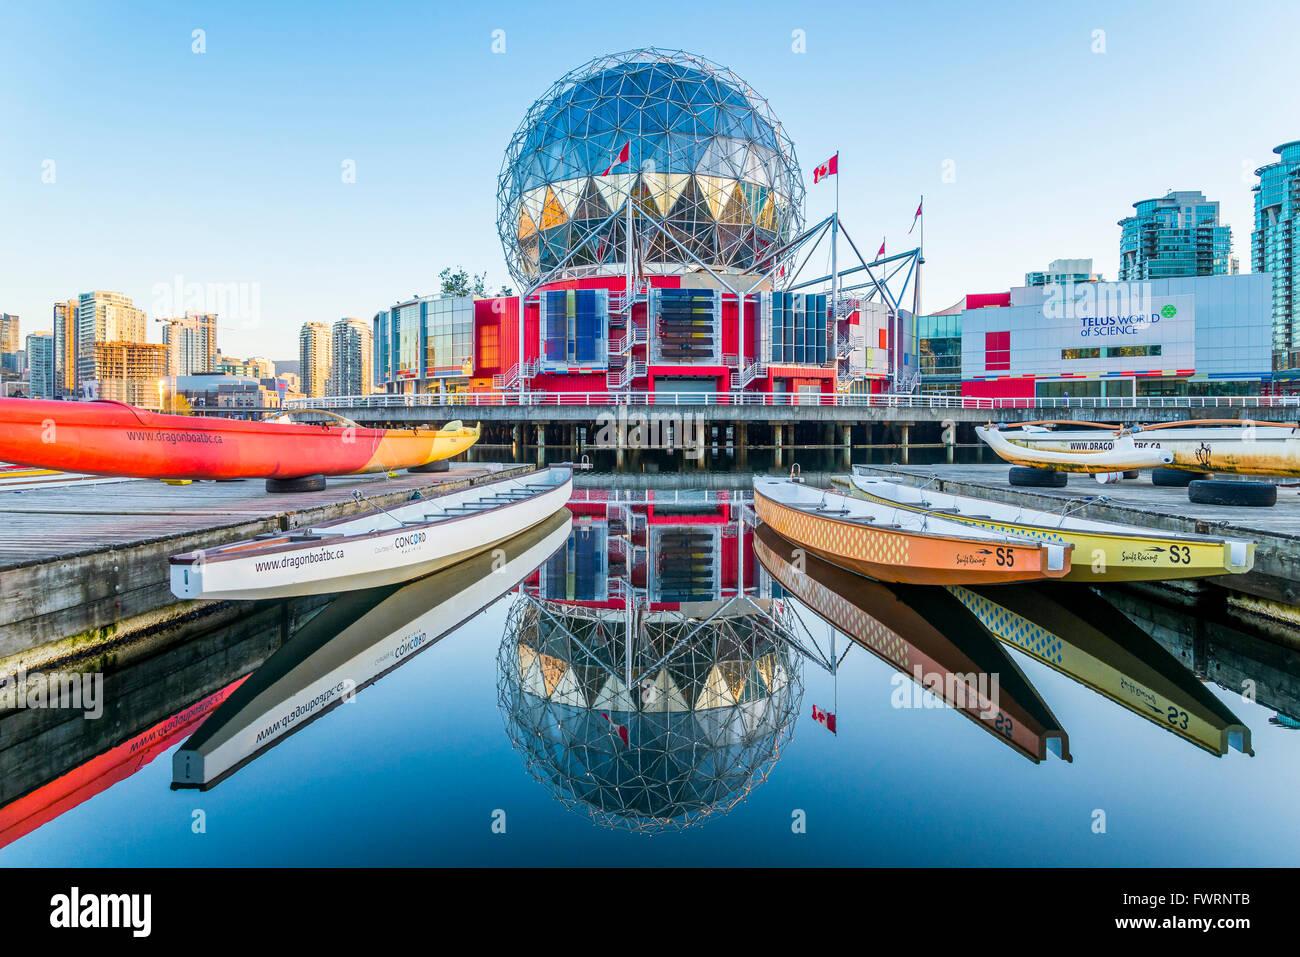 Monde des sciences Telus, False Creek, Vancouver British Columbia, Canada Photo Stock